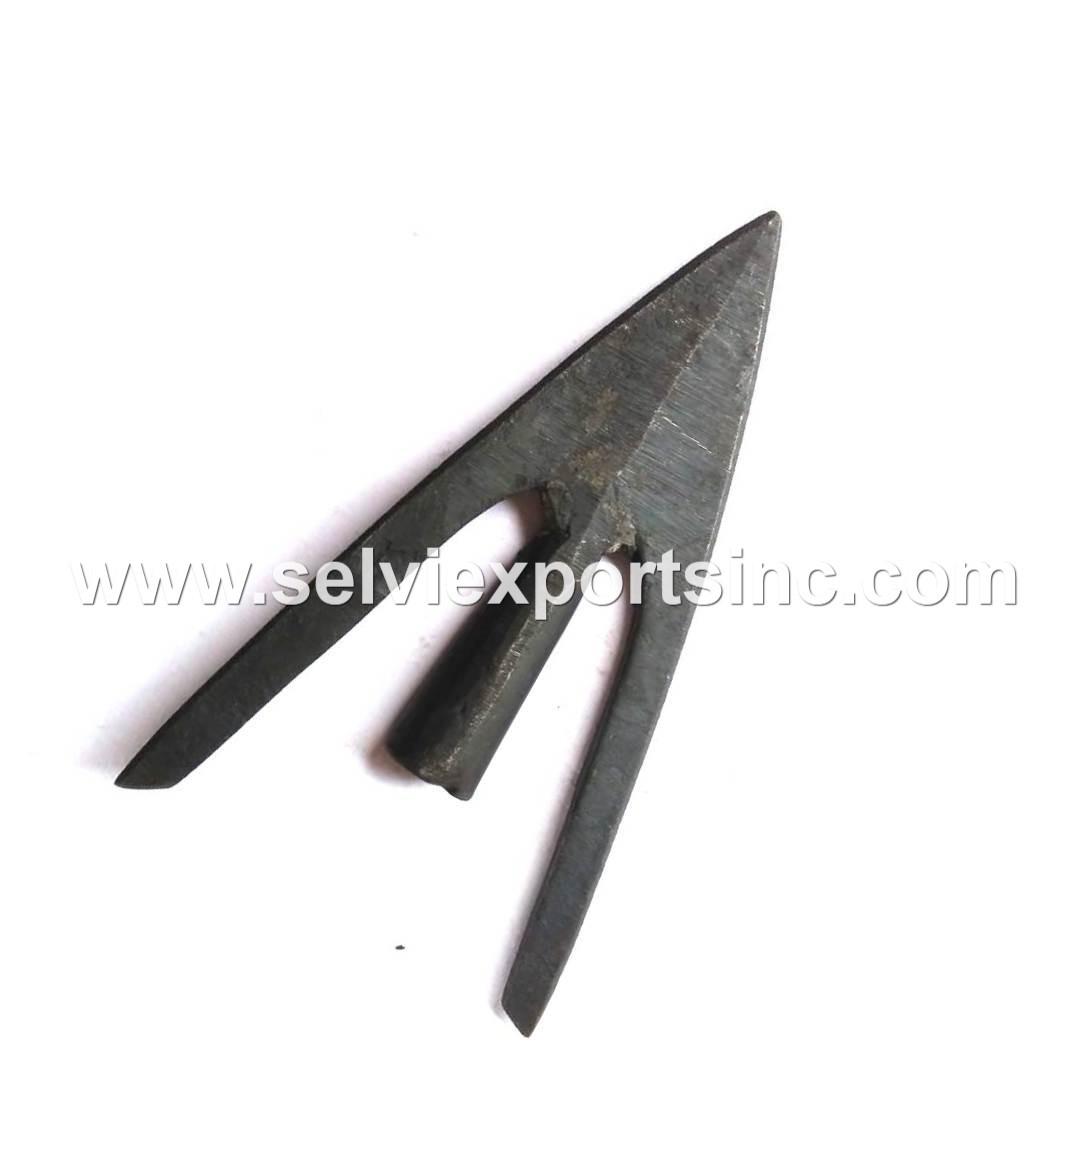 Medieval Tail Broadhead Arrowhead